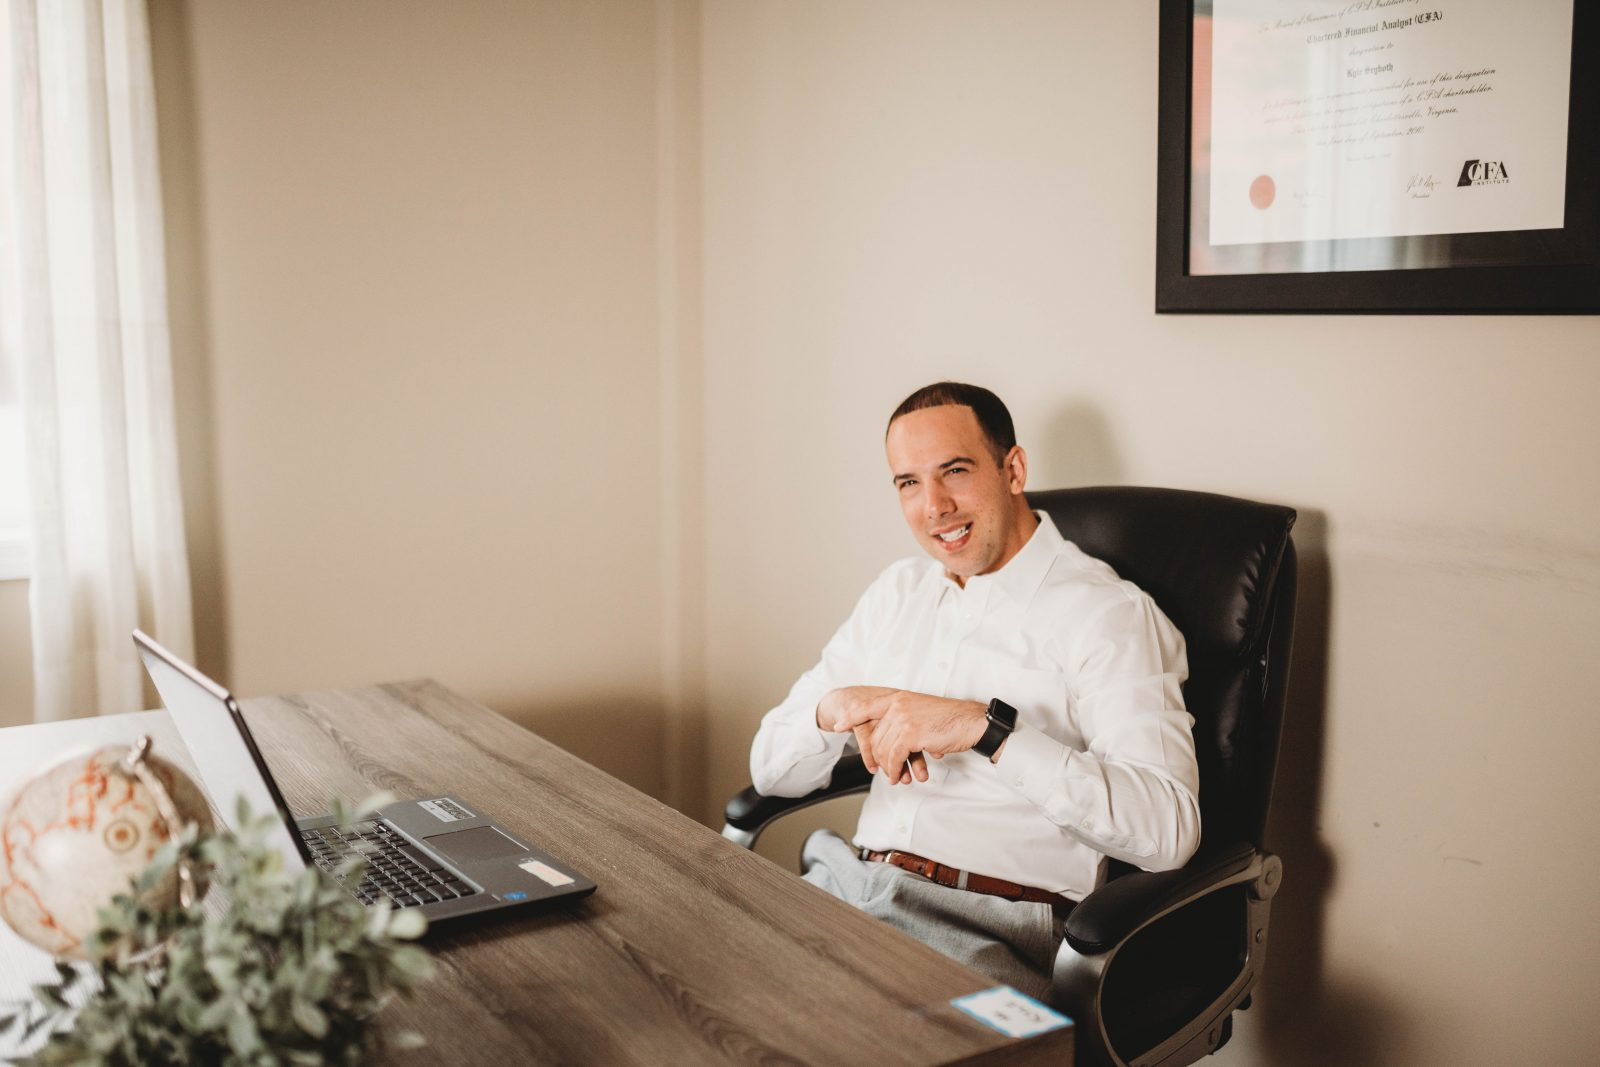 Kyle Seyboth - Working with Buyers